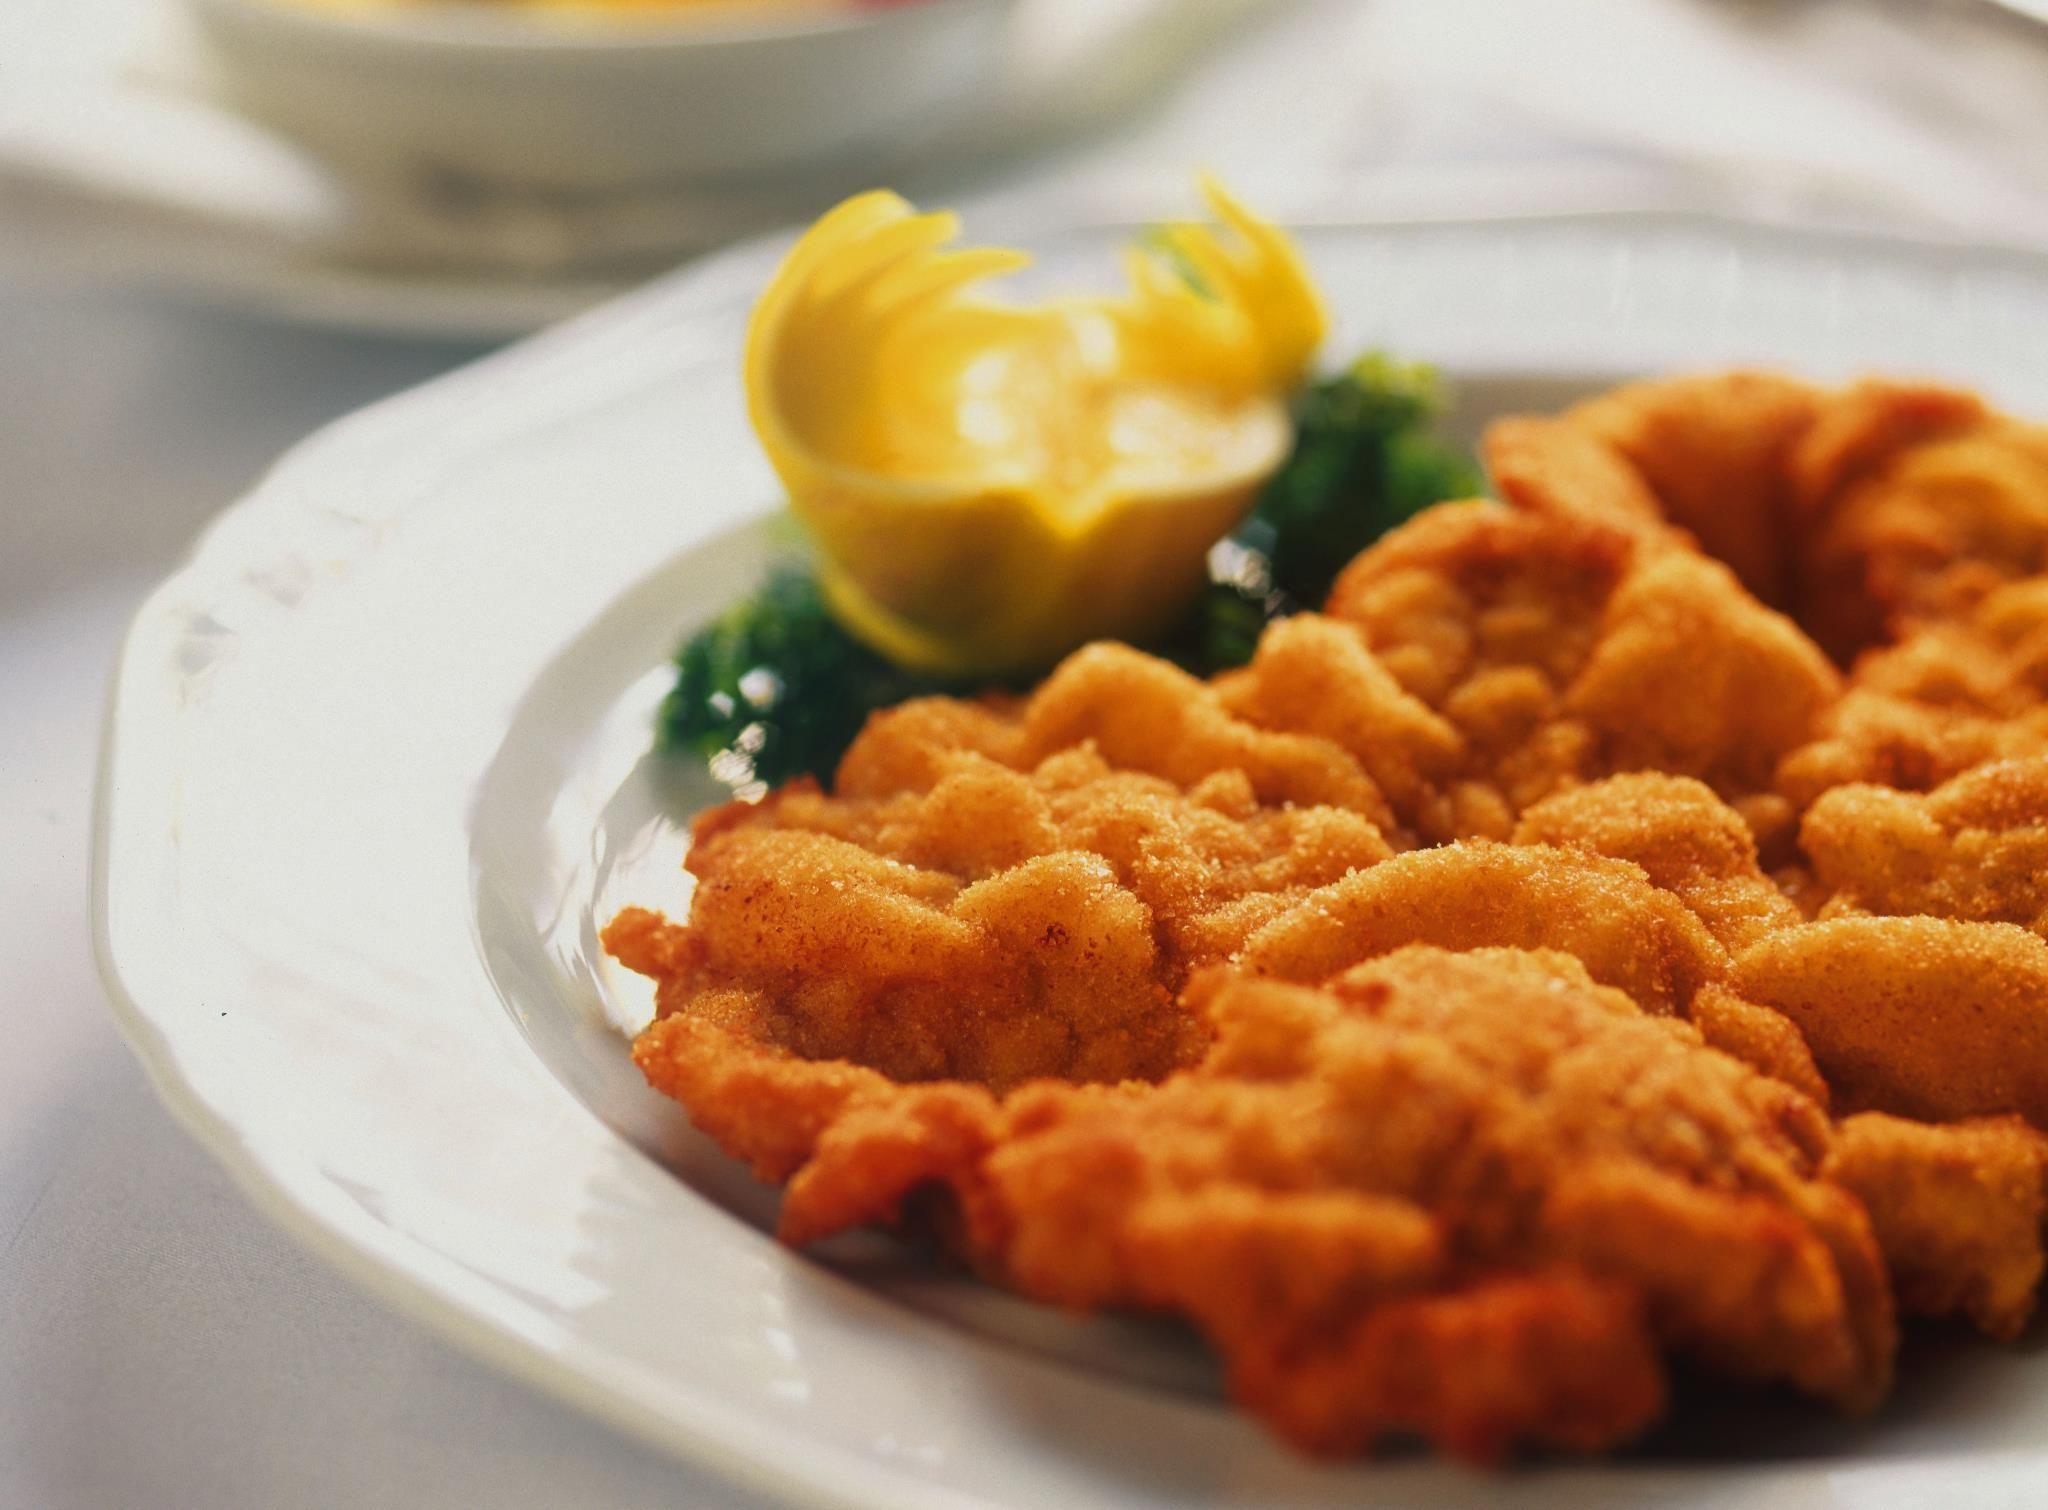 Wiener schnitzel recipes dishmaps for Austrian cuisine